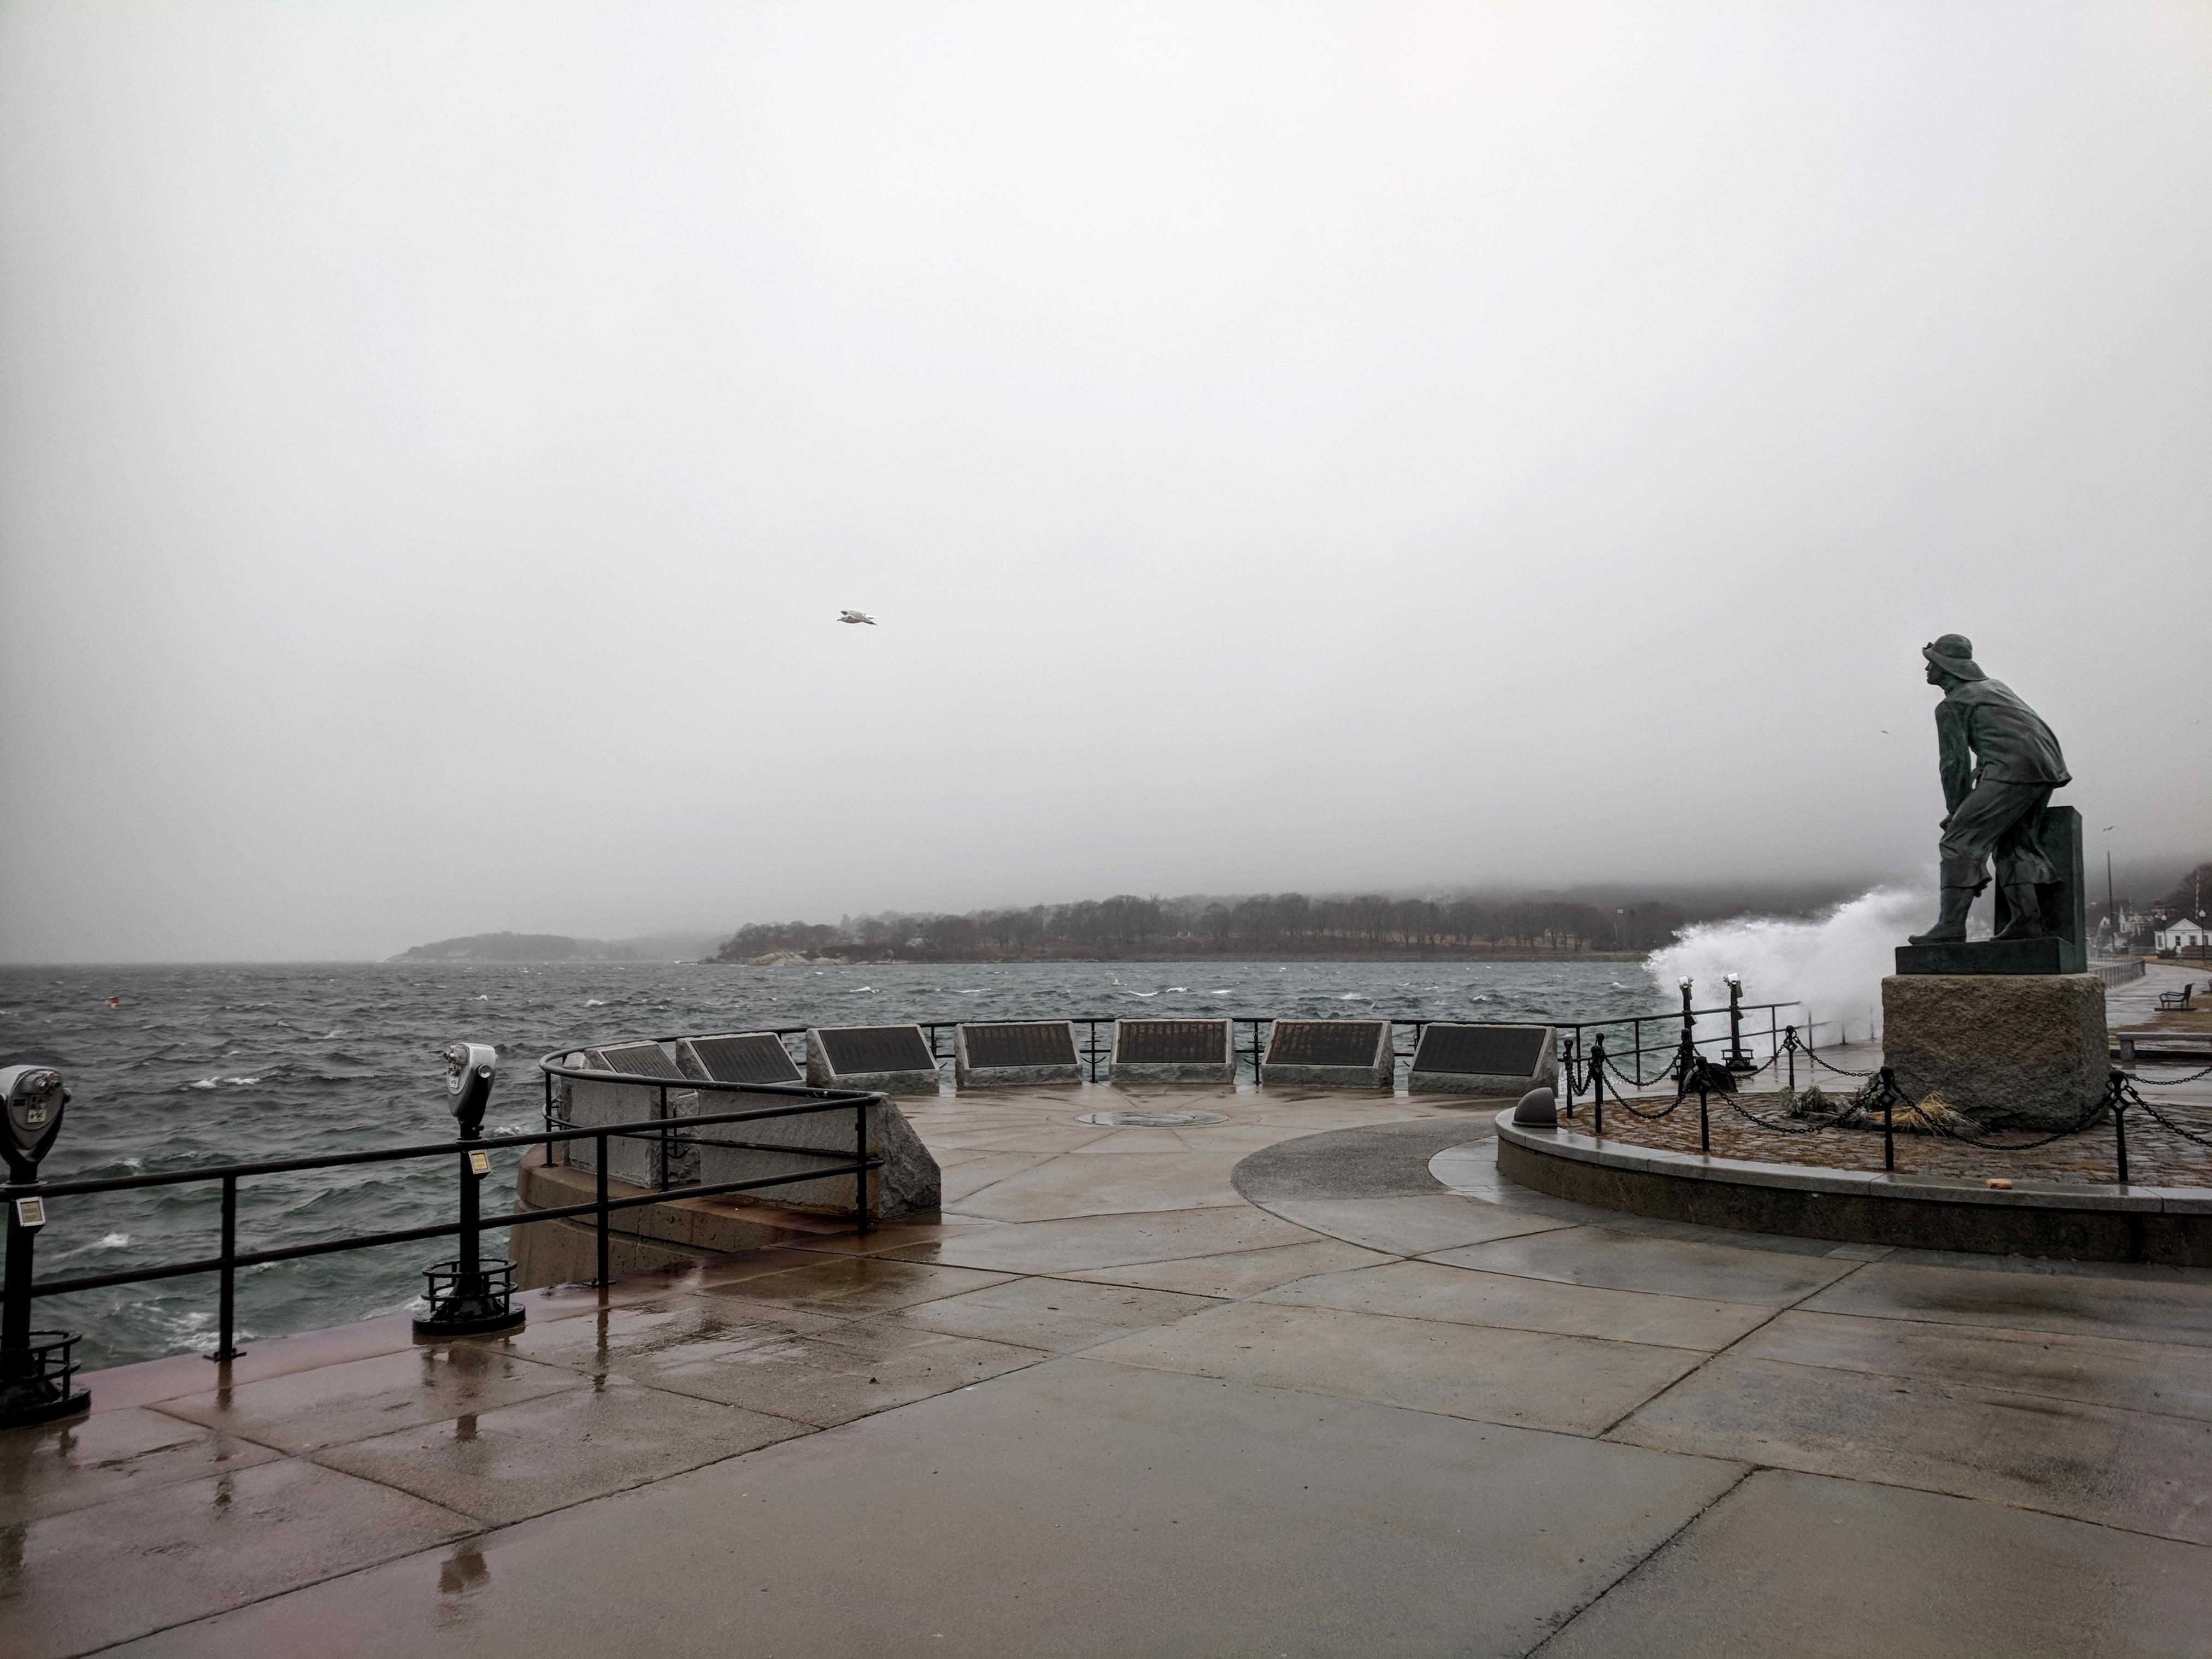 riding out Dec 21 storm_Stacy Boulevard promenade near Man at the Wheel memorial_Gloucester Harbor_Gloucester MA_©c ryan (2)